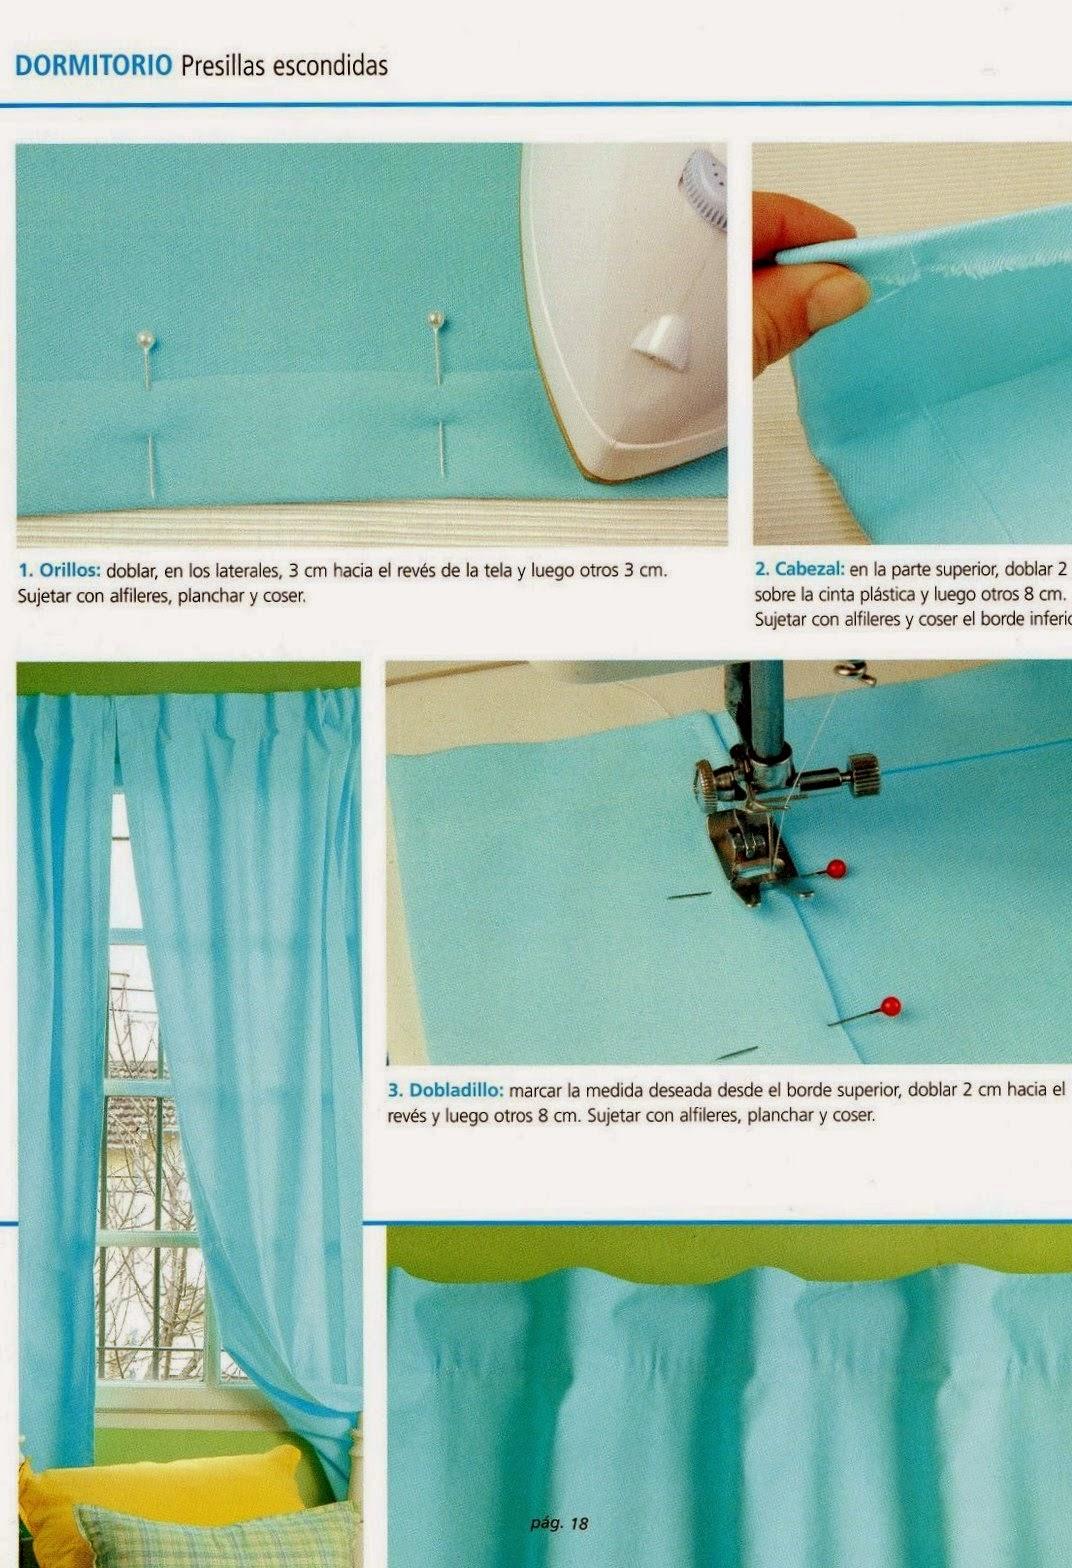 Como hacer cortinas paso a paso revistas de manualidades - Como hacer unas cortinas paso a paso ...